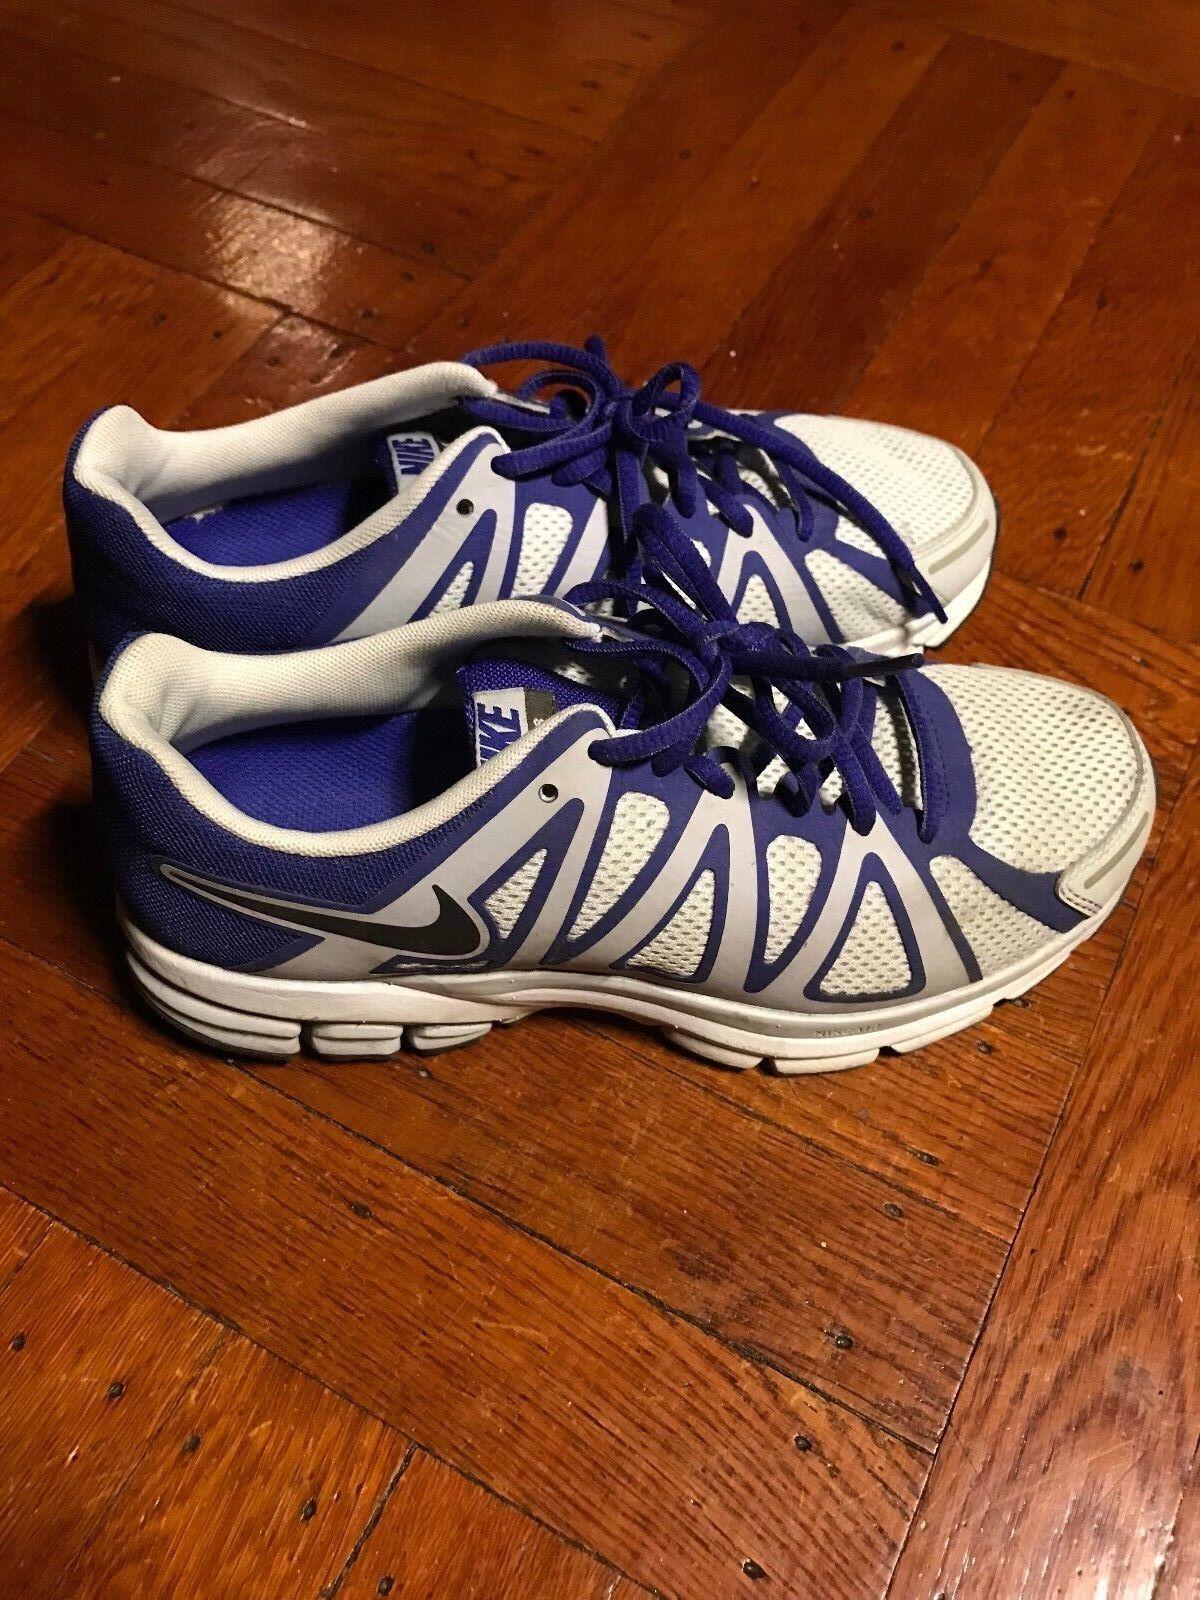 Nike Air Span+ 8 Sneakers - Purple Gray - Women's Comfortable Casual wild